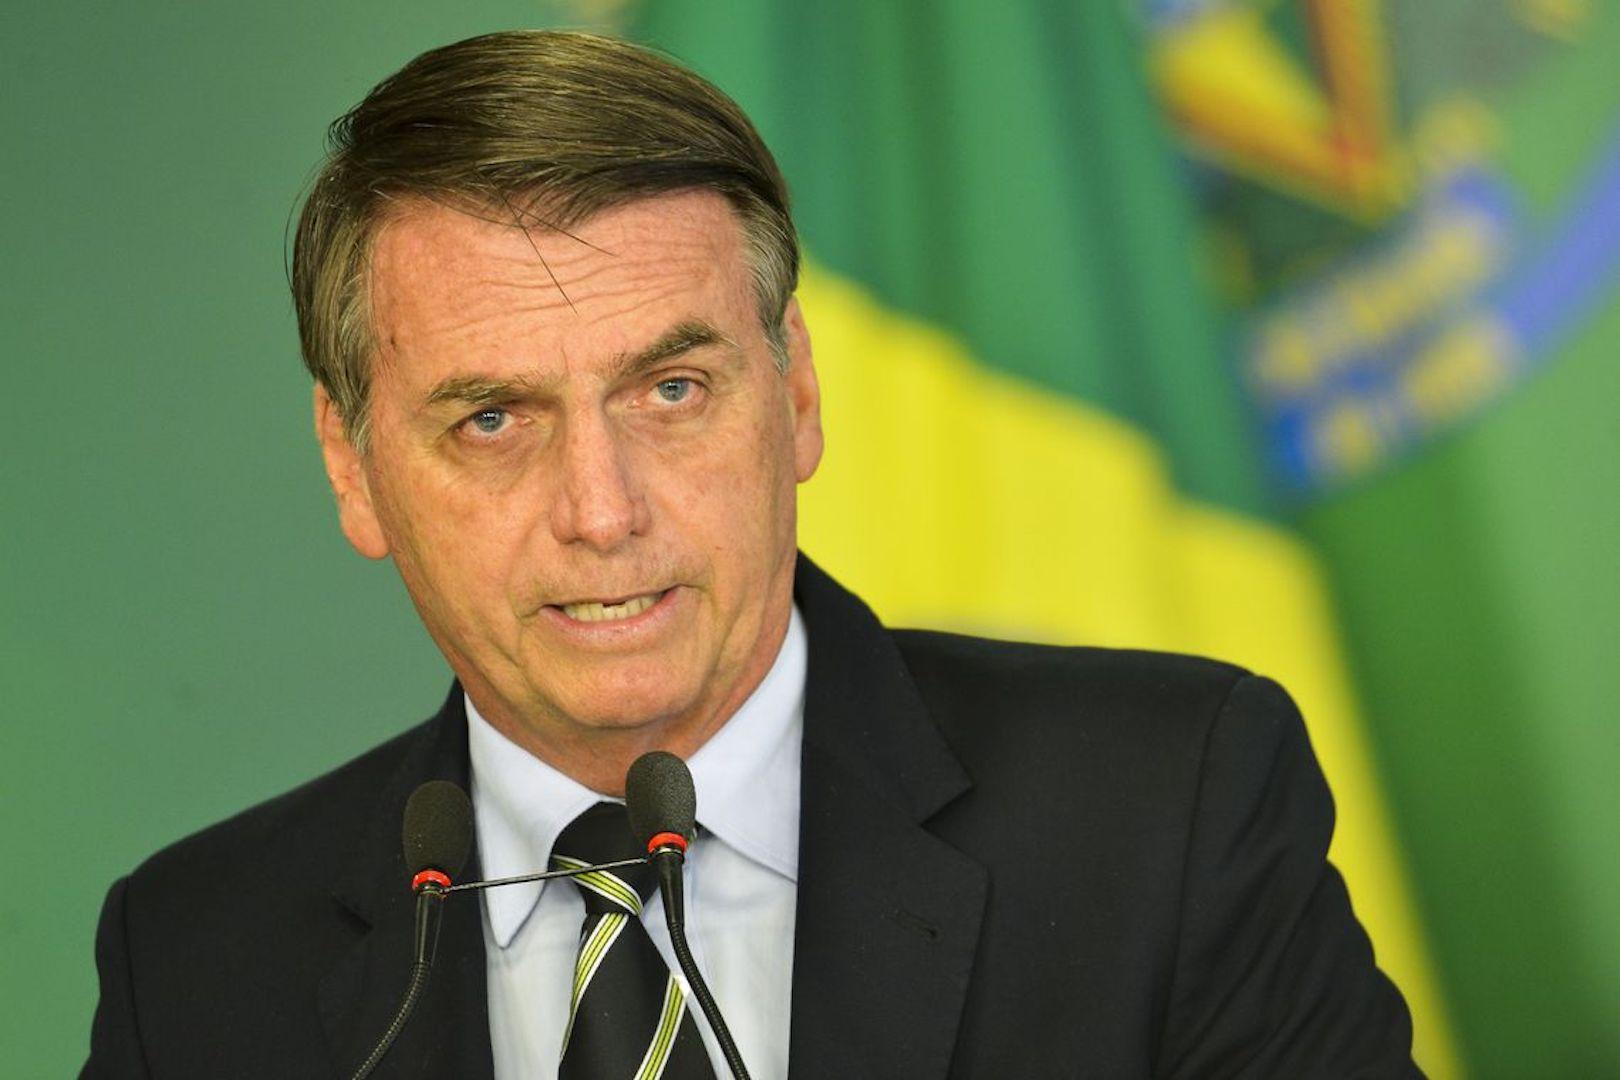 bolsonaro - photo #20